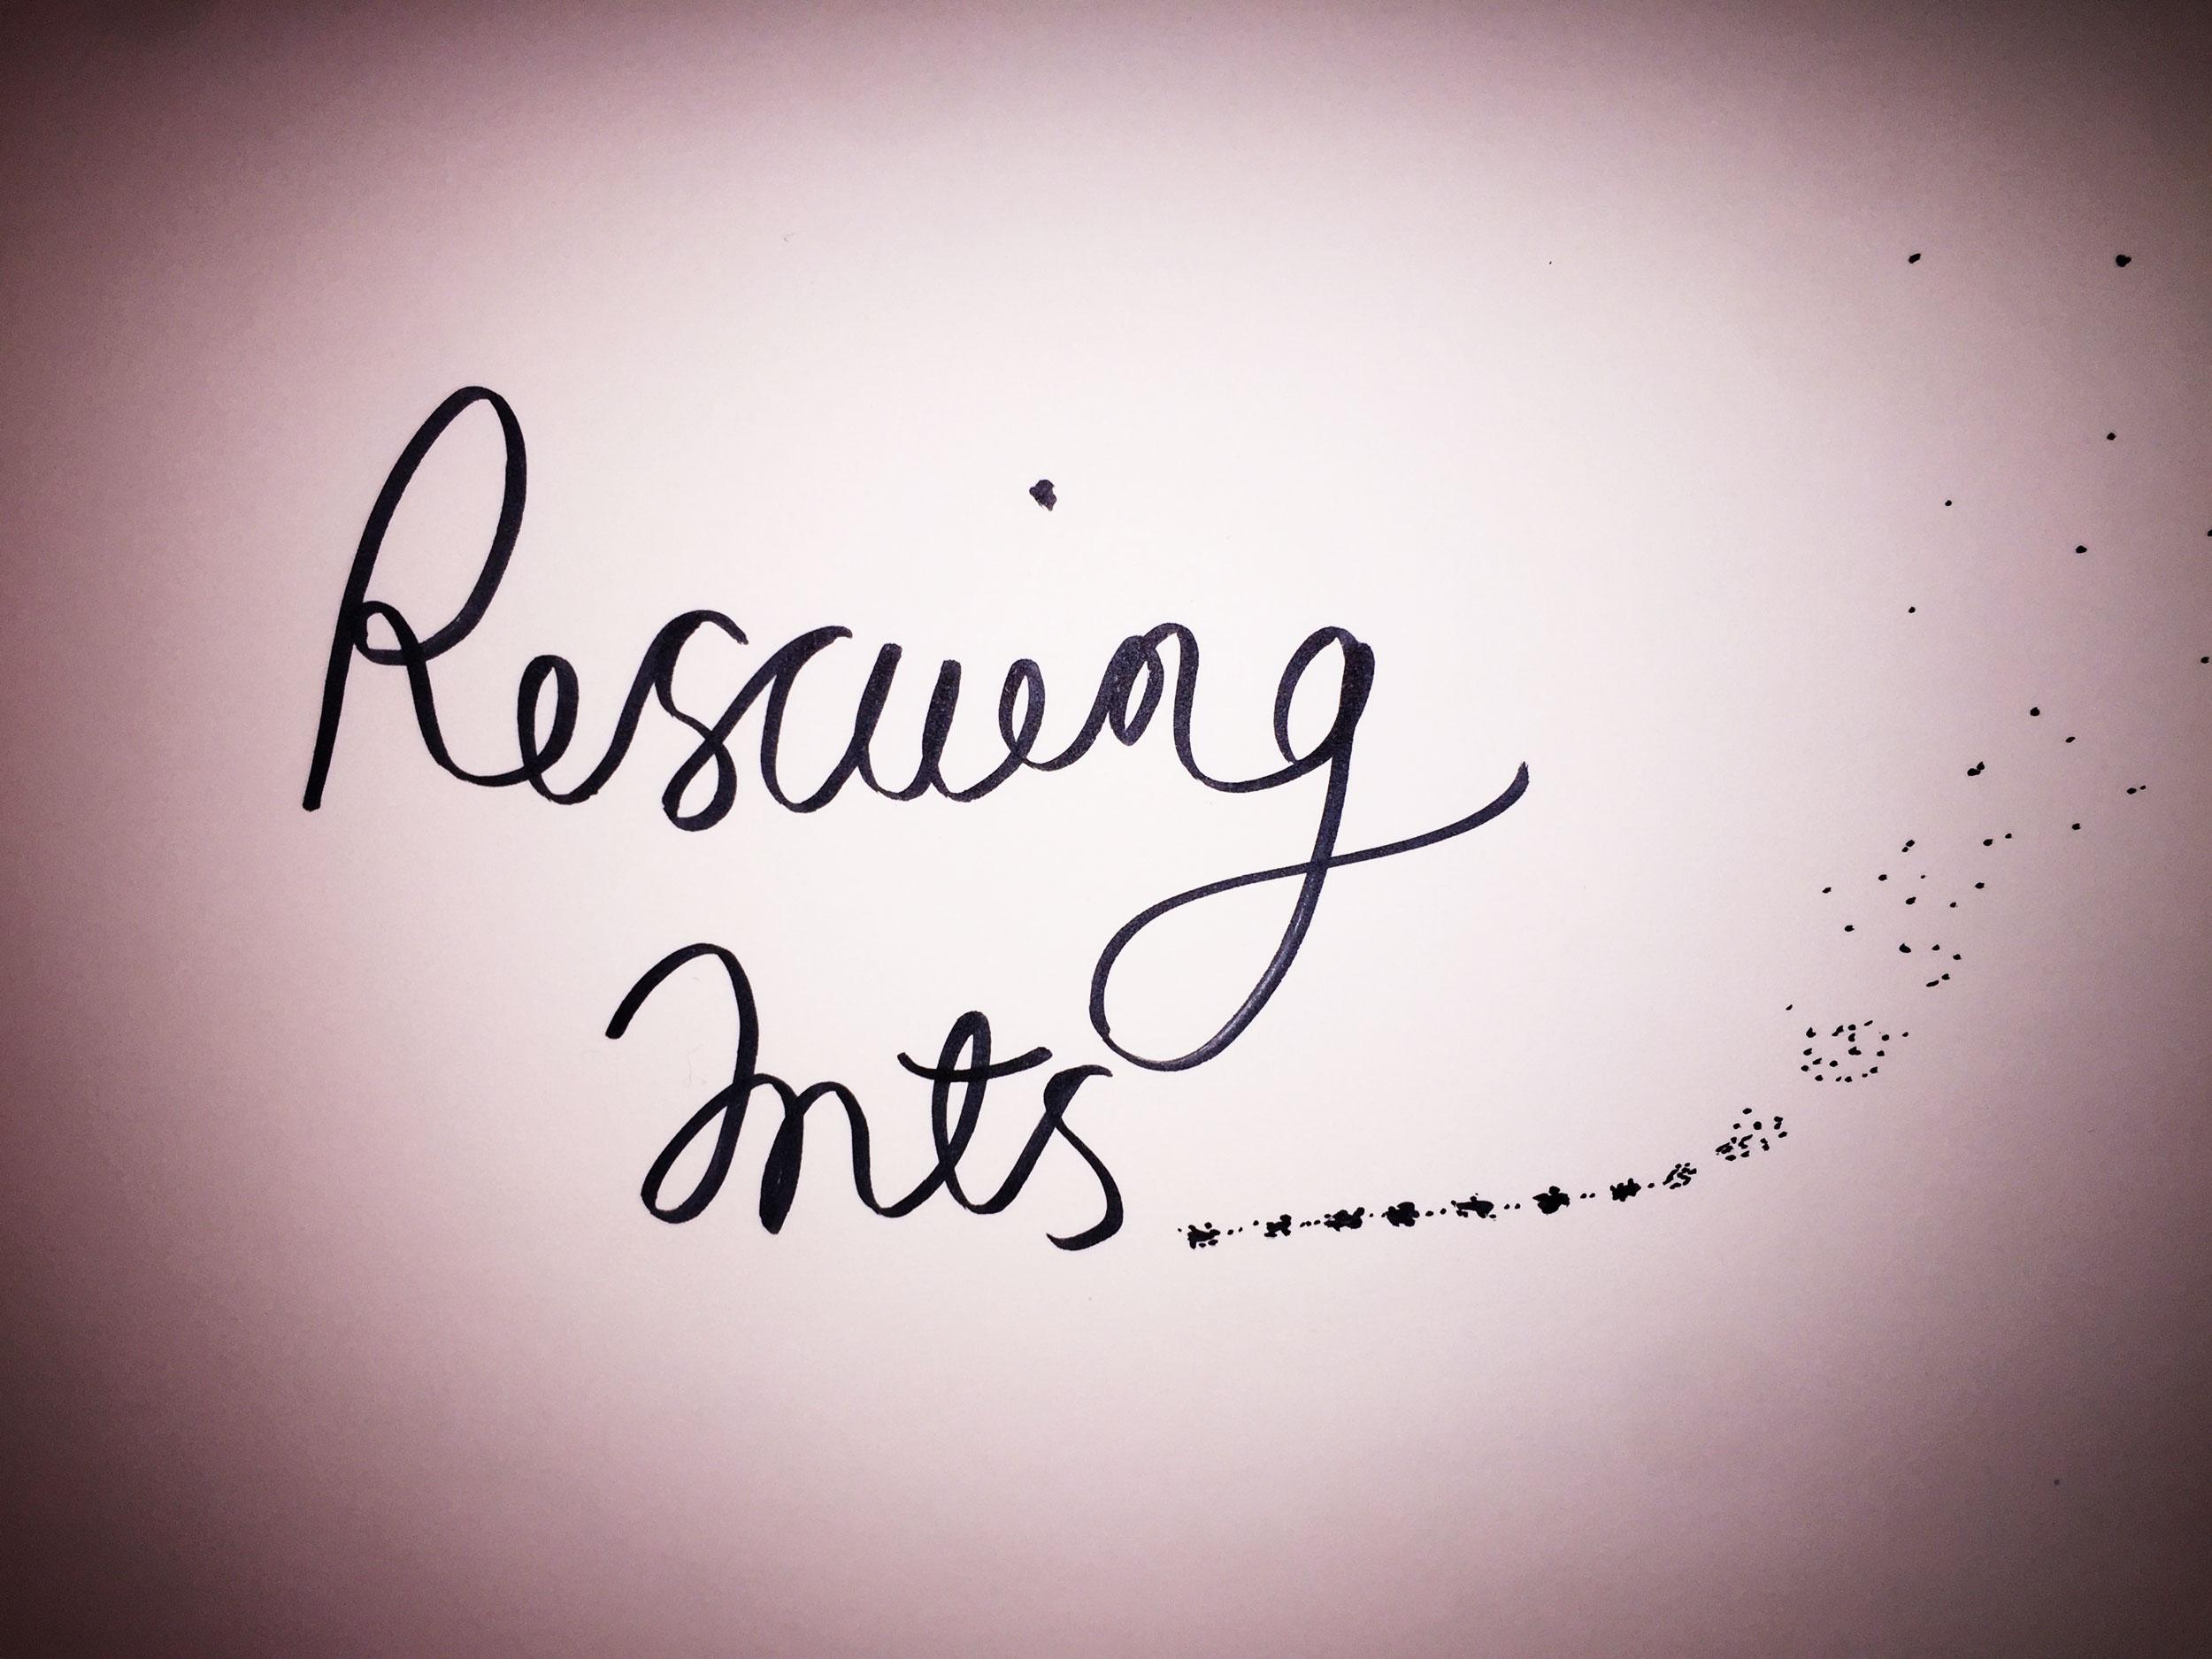 Rescuing ants. Drawing Luke Hockley.